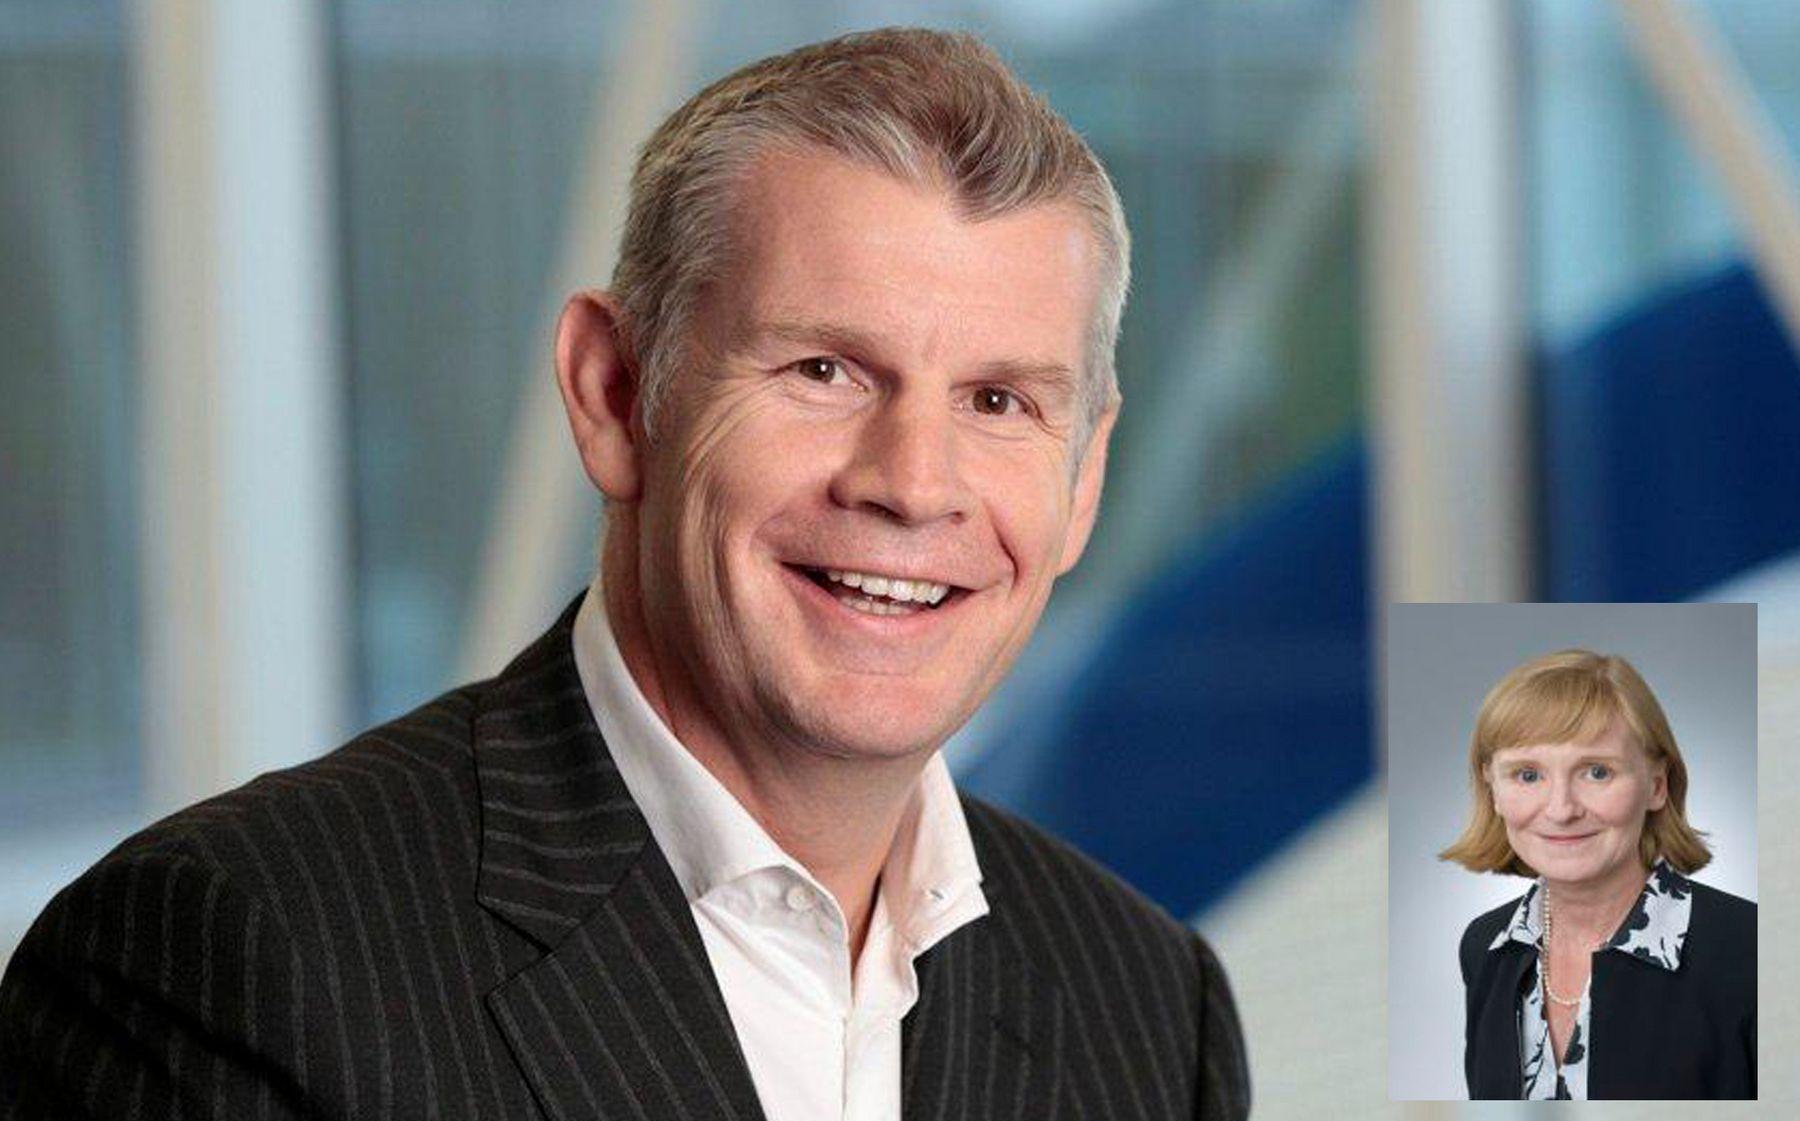 Two global executives join WRU Board